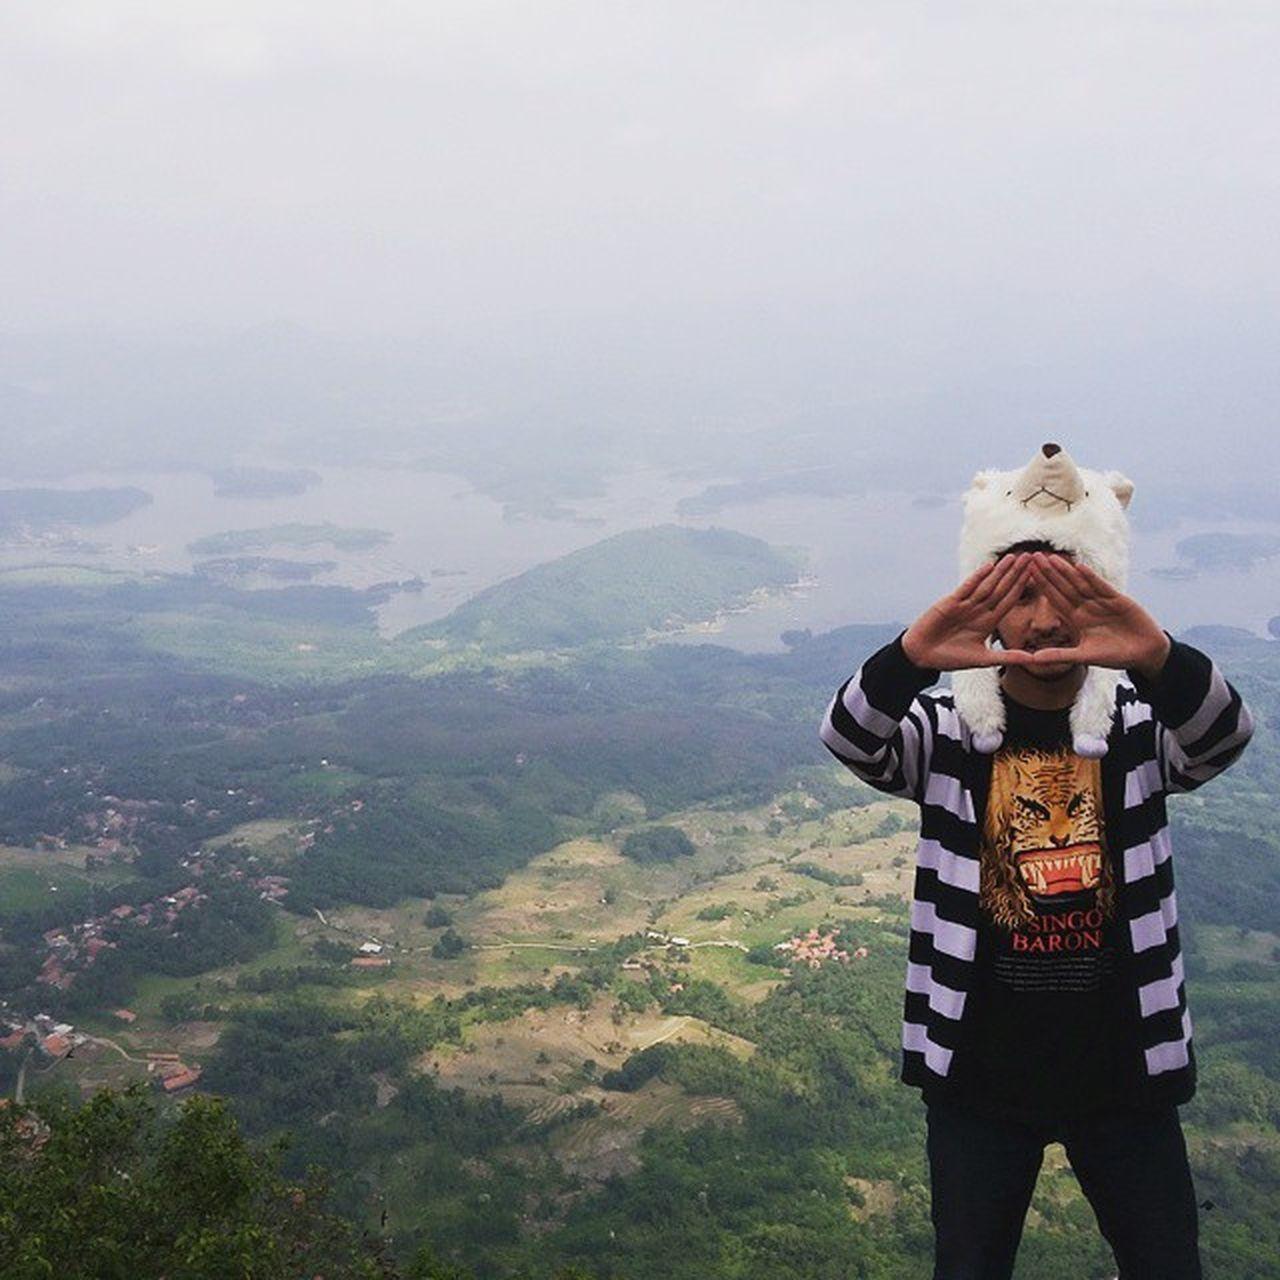 Kapan kamu ada waktu untuk naik gunung bareng aku?? Ridwanderful TravelingPakeReceh JarambahBandung DiBawahLangitBandung BandungIsMe